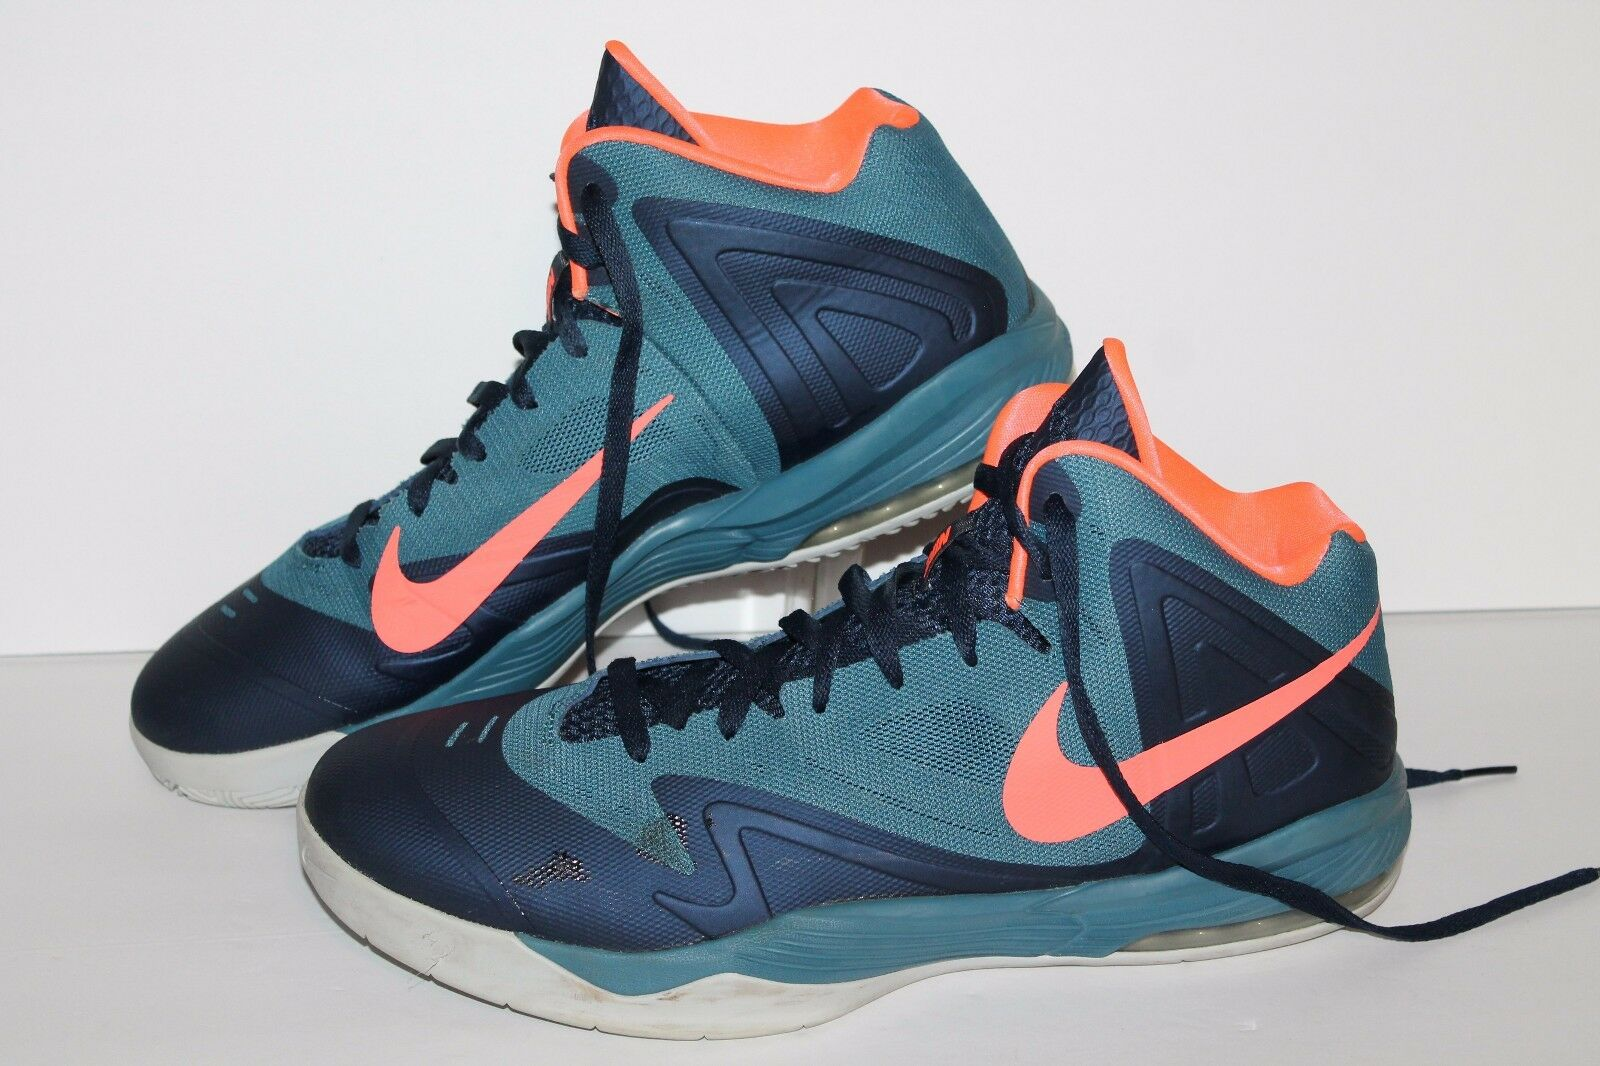 Nike Air Max Premiere Basketball Shoes, Navy/Blue/Mango, Men's 14 Seasonal price cuts, discount benefits